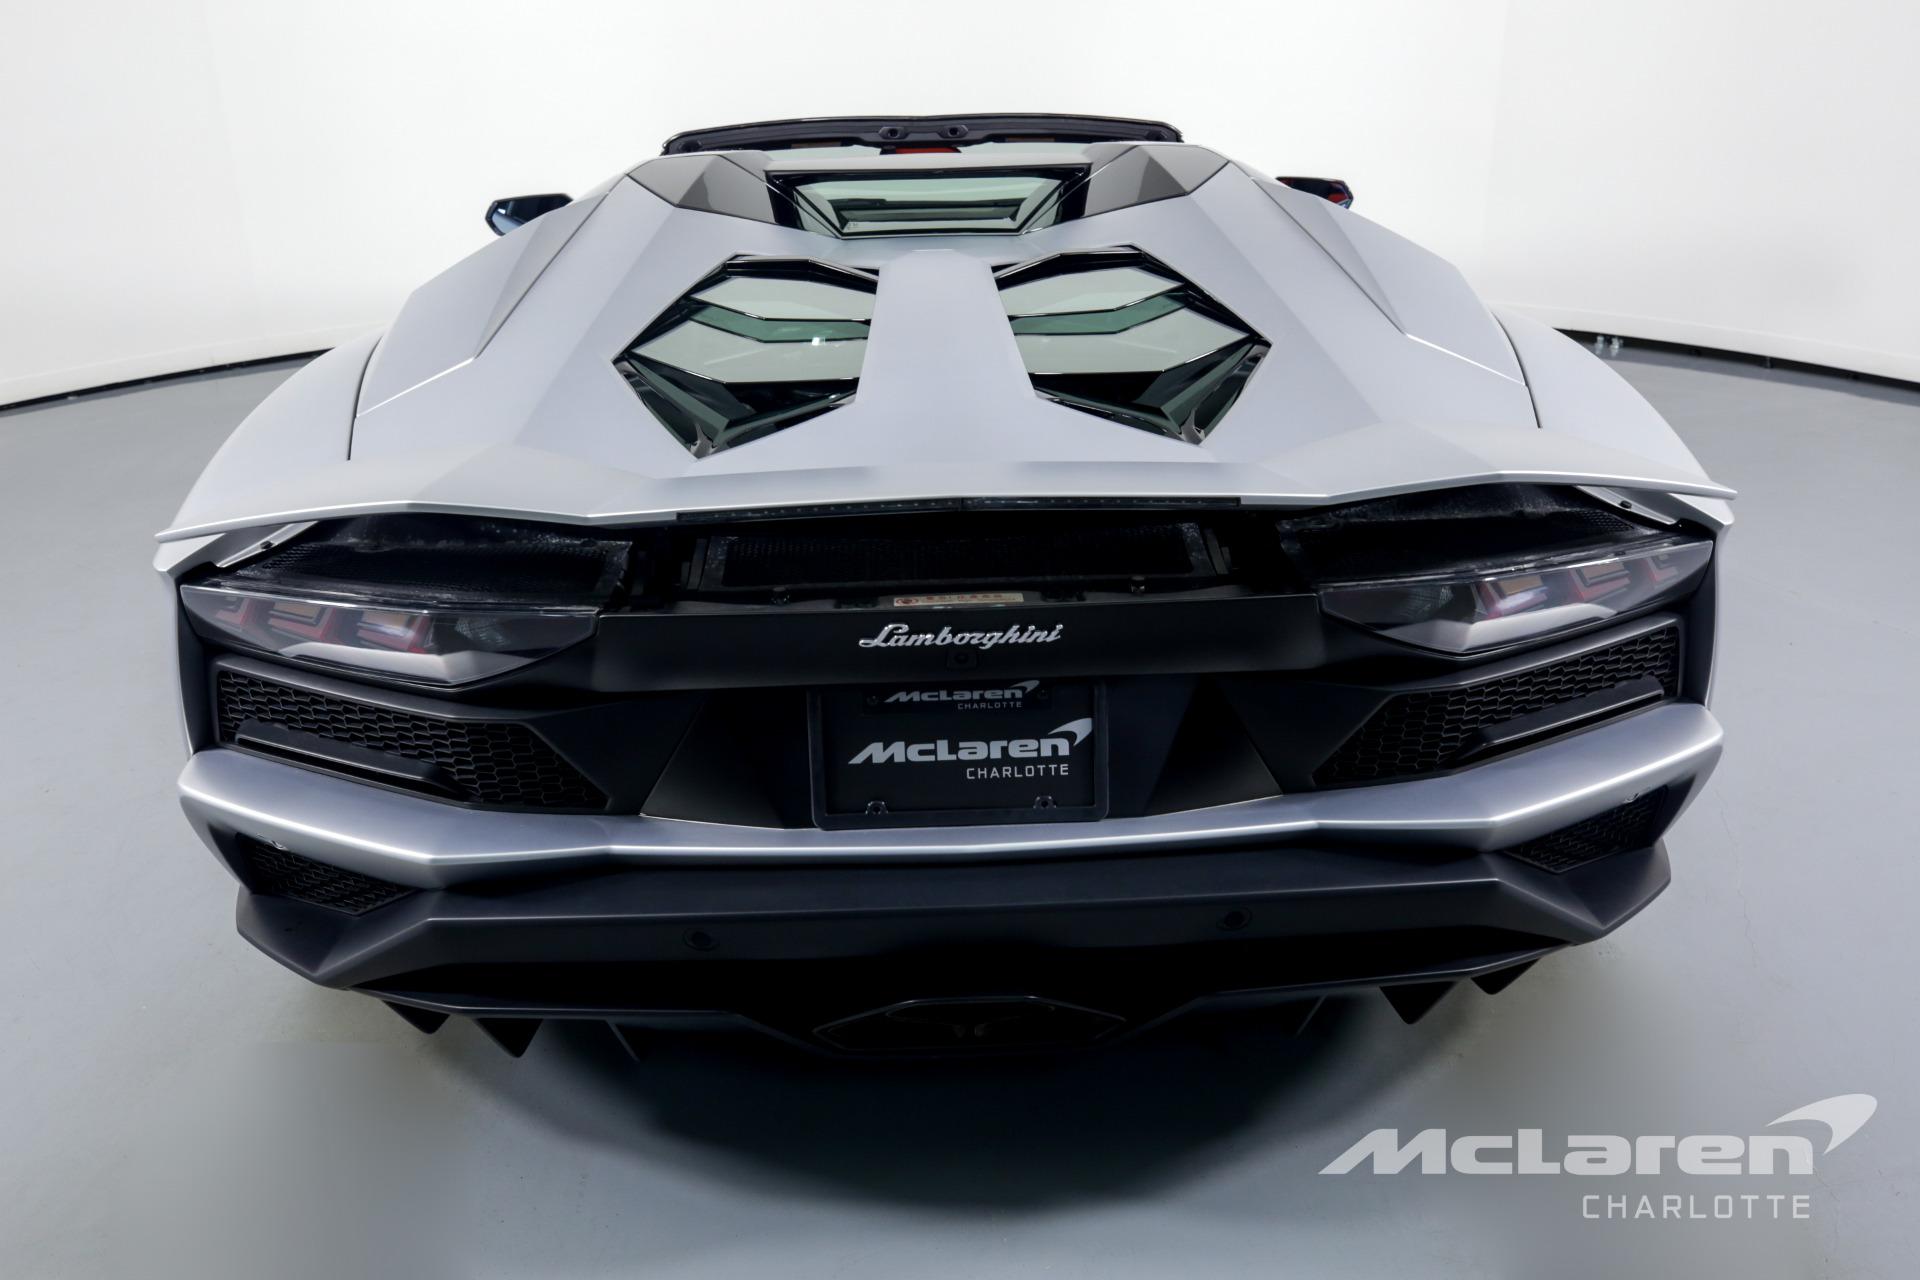 Used 2019 Lamborghini Aventador LP 740-4 S | Charlotte, NC